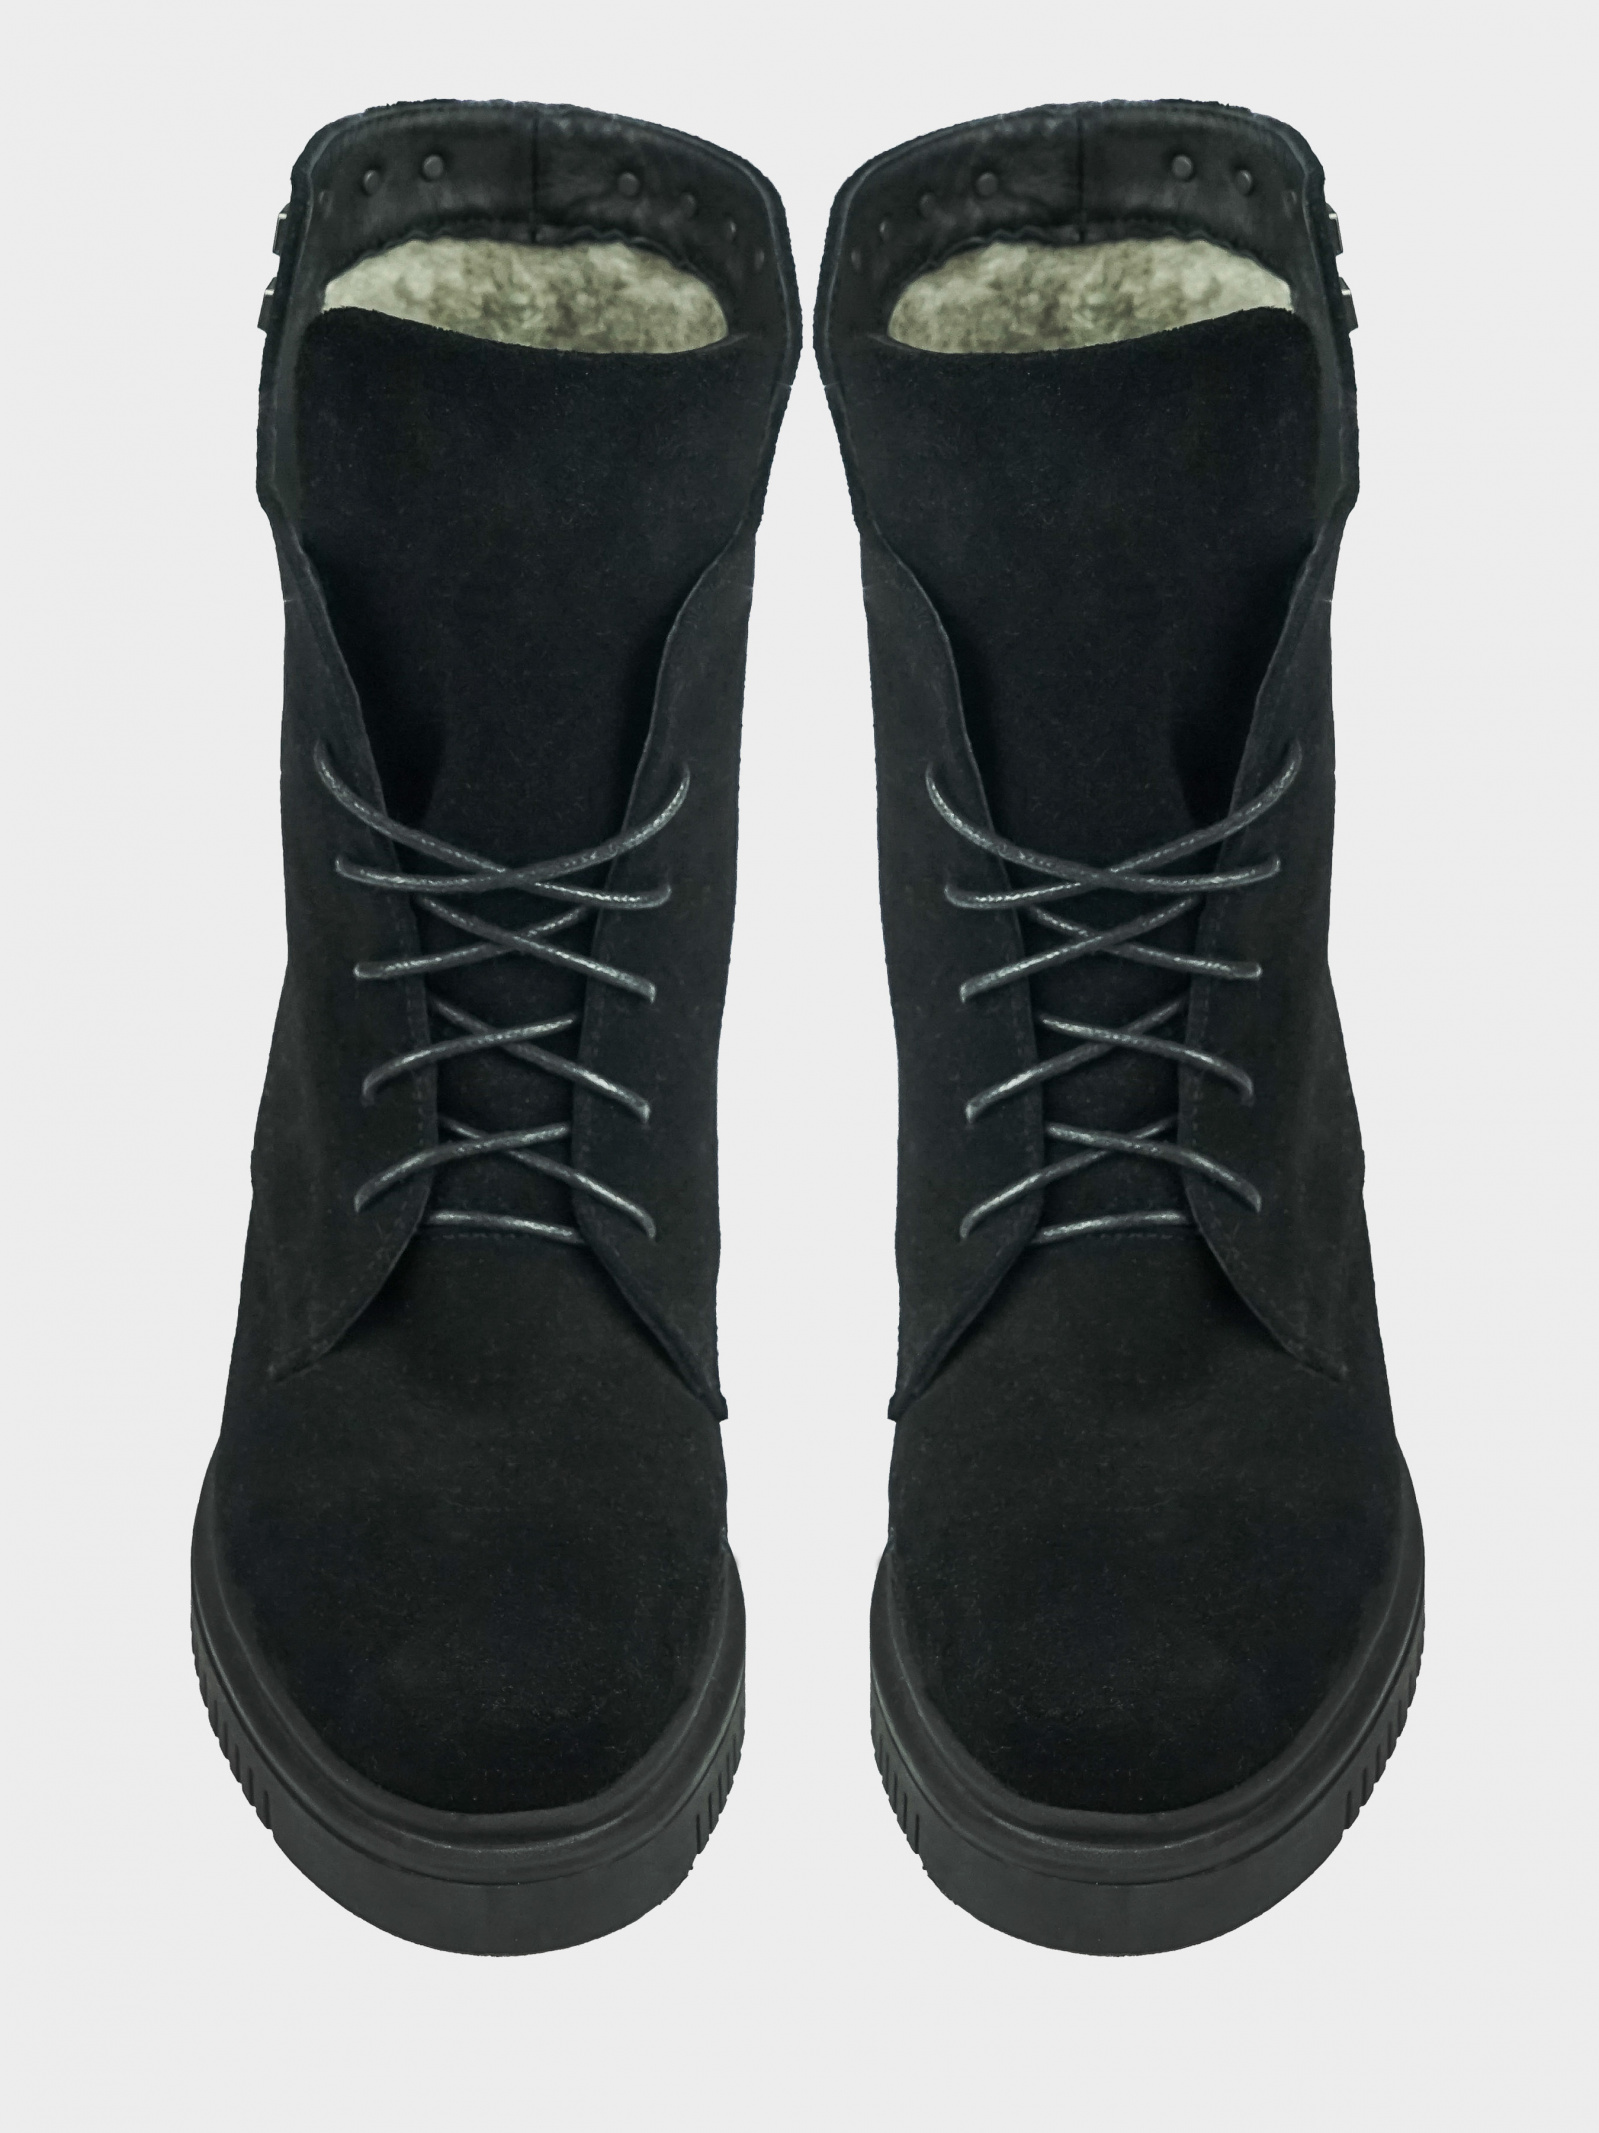 Ботинки женские Ботинки LZ6318-21 продажа, 2017